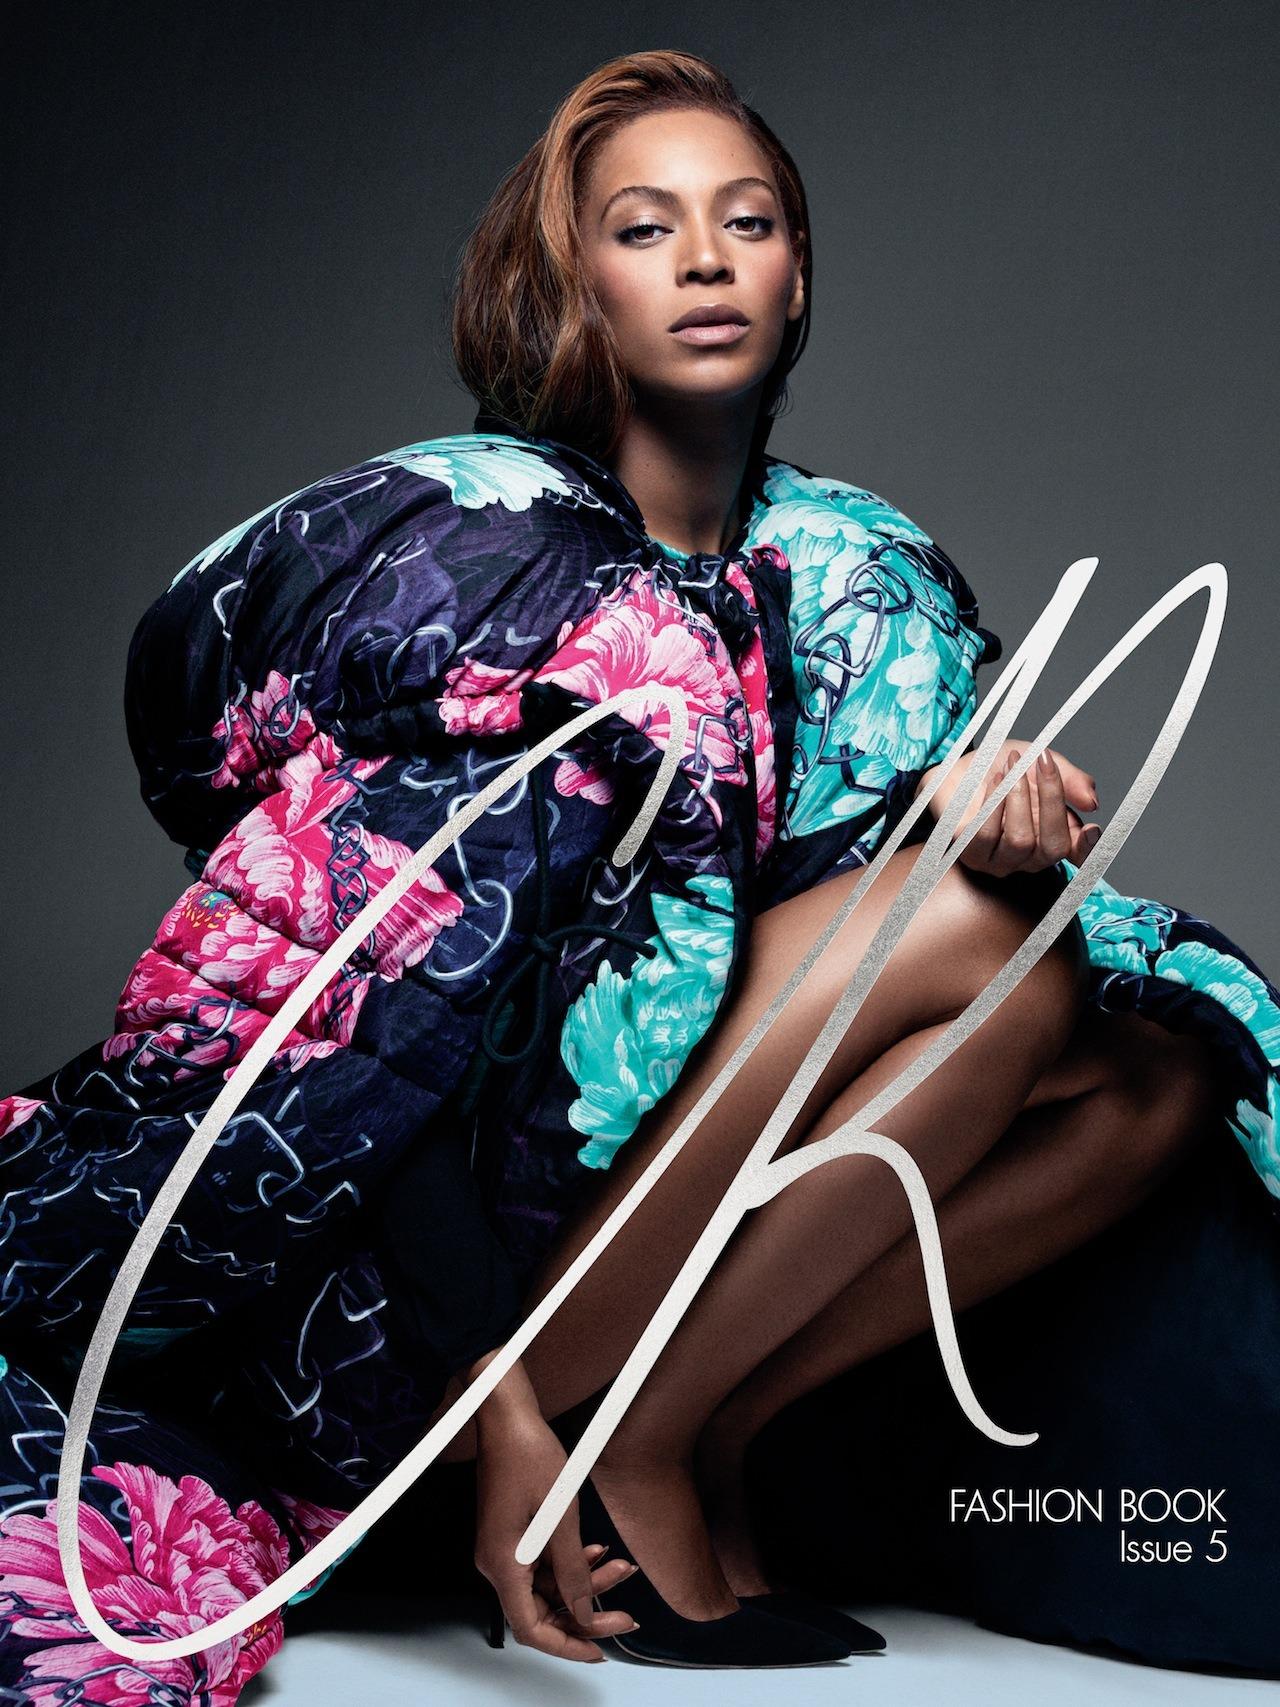 Fotos de Beyoncé > Nuevos Shoots, Campañas, Portadas, etc. - Página 43 Tumblr_nb0rrvaXxj1rf43pdo1_r1_1280